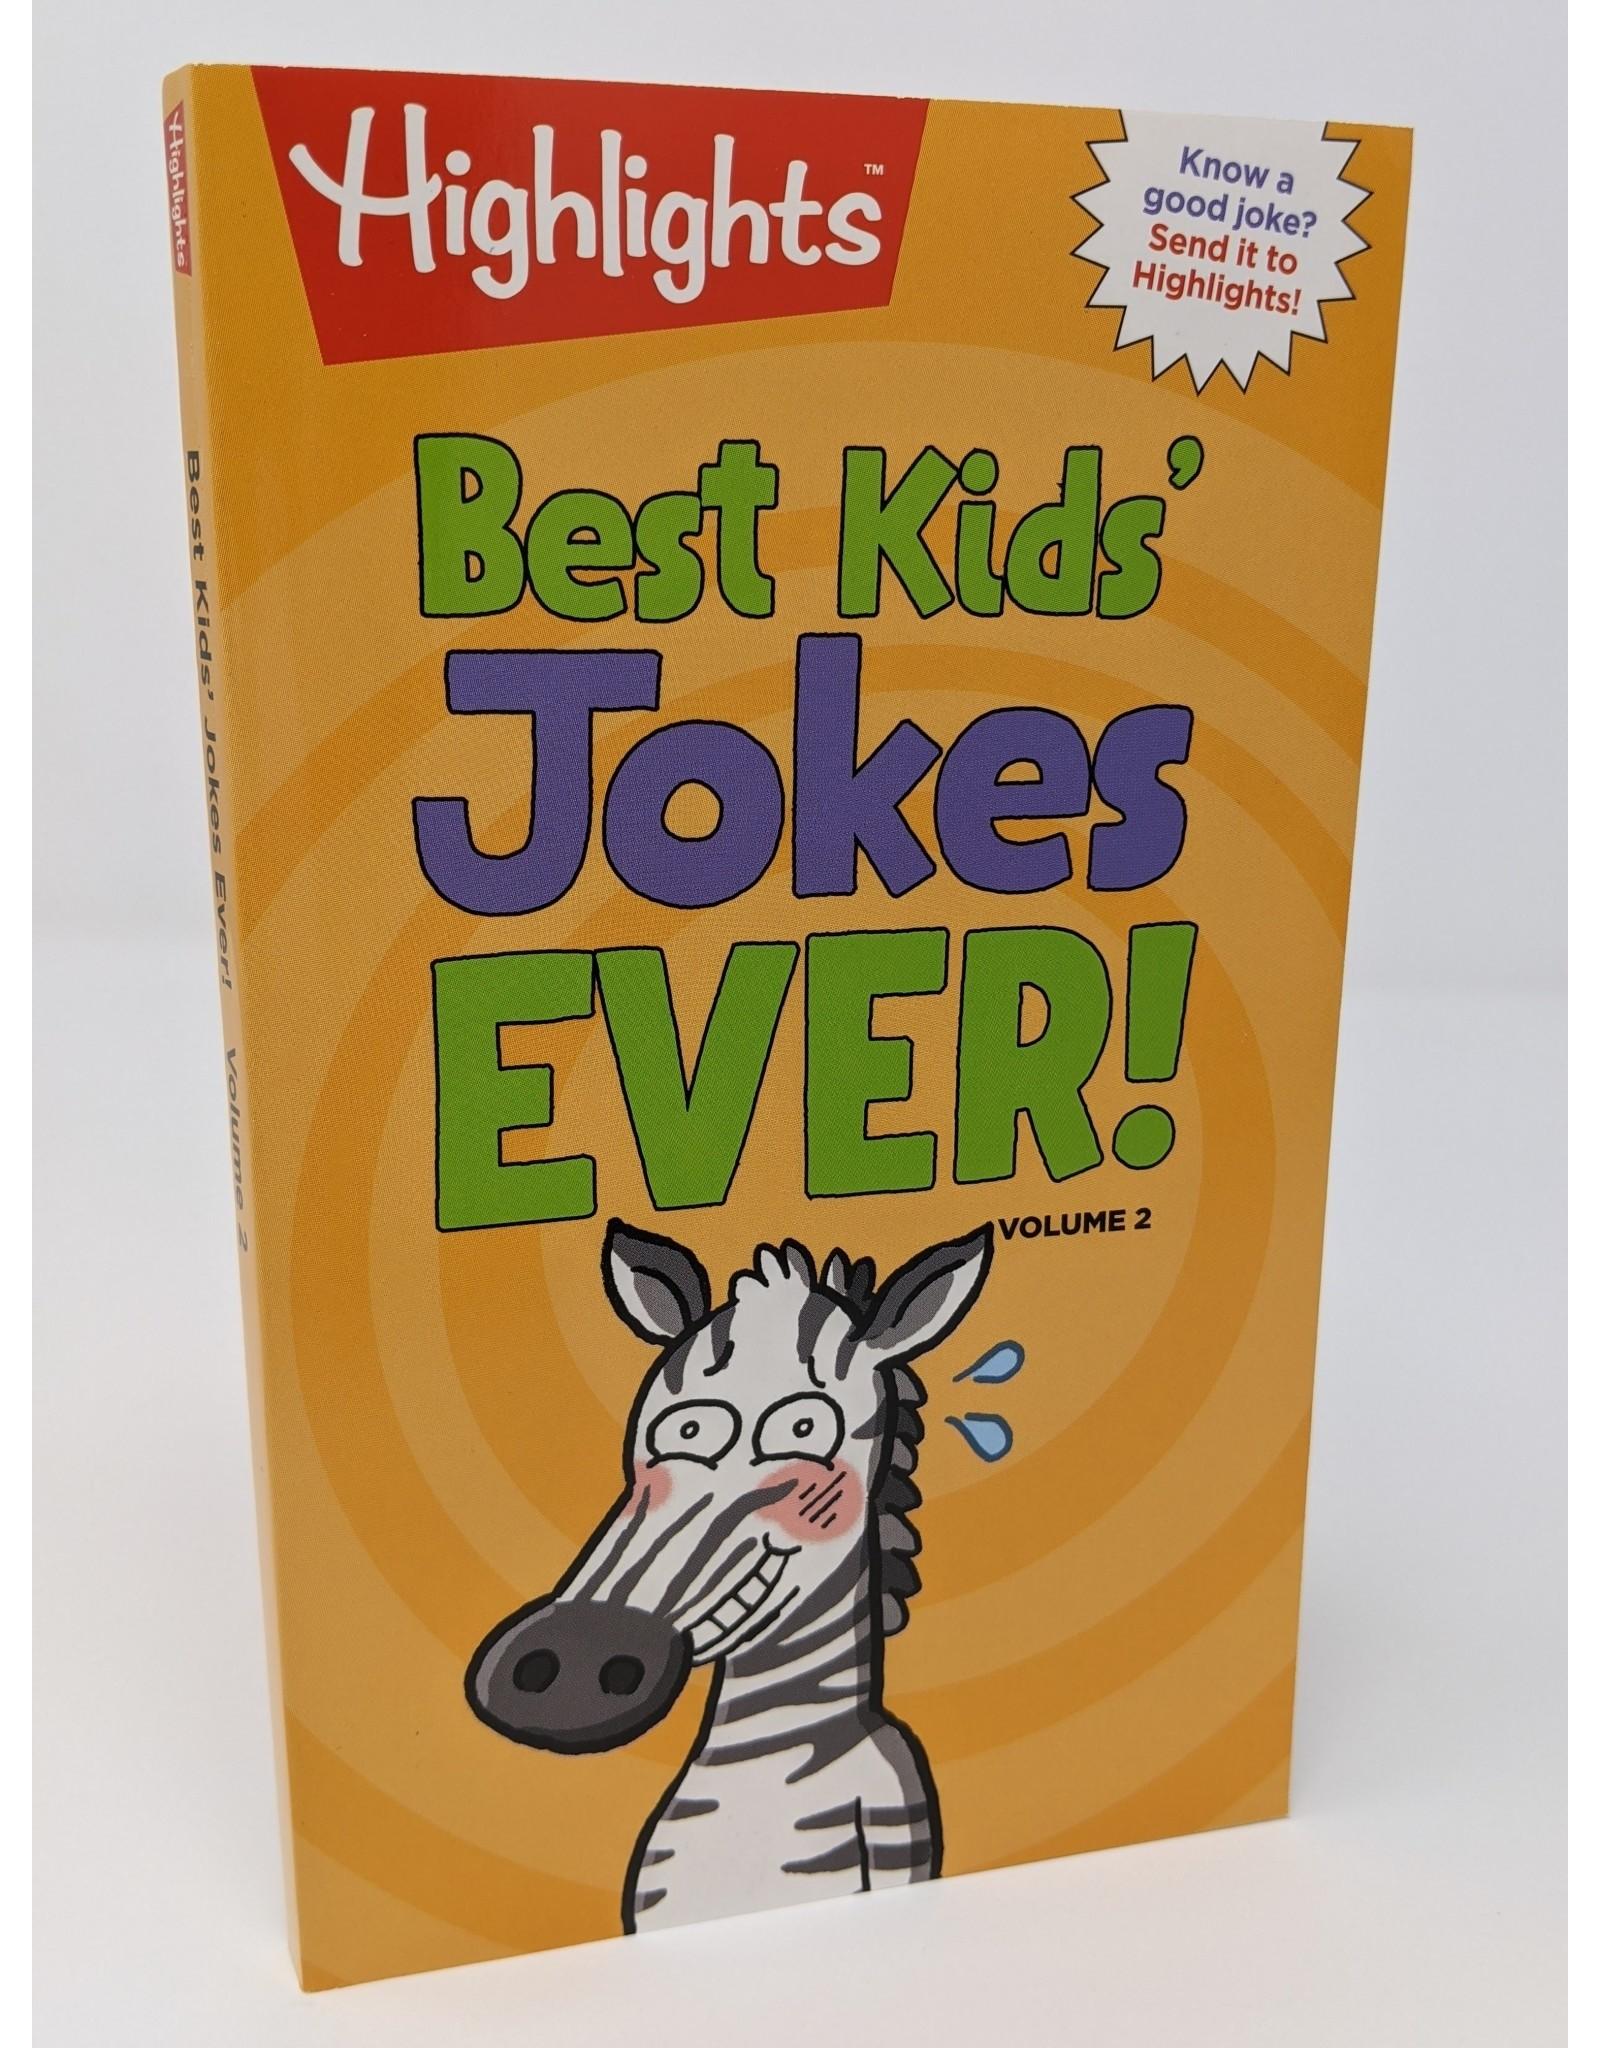 Highlights Best Kids' Jokes Ever! - volume 2